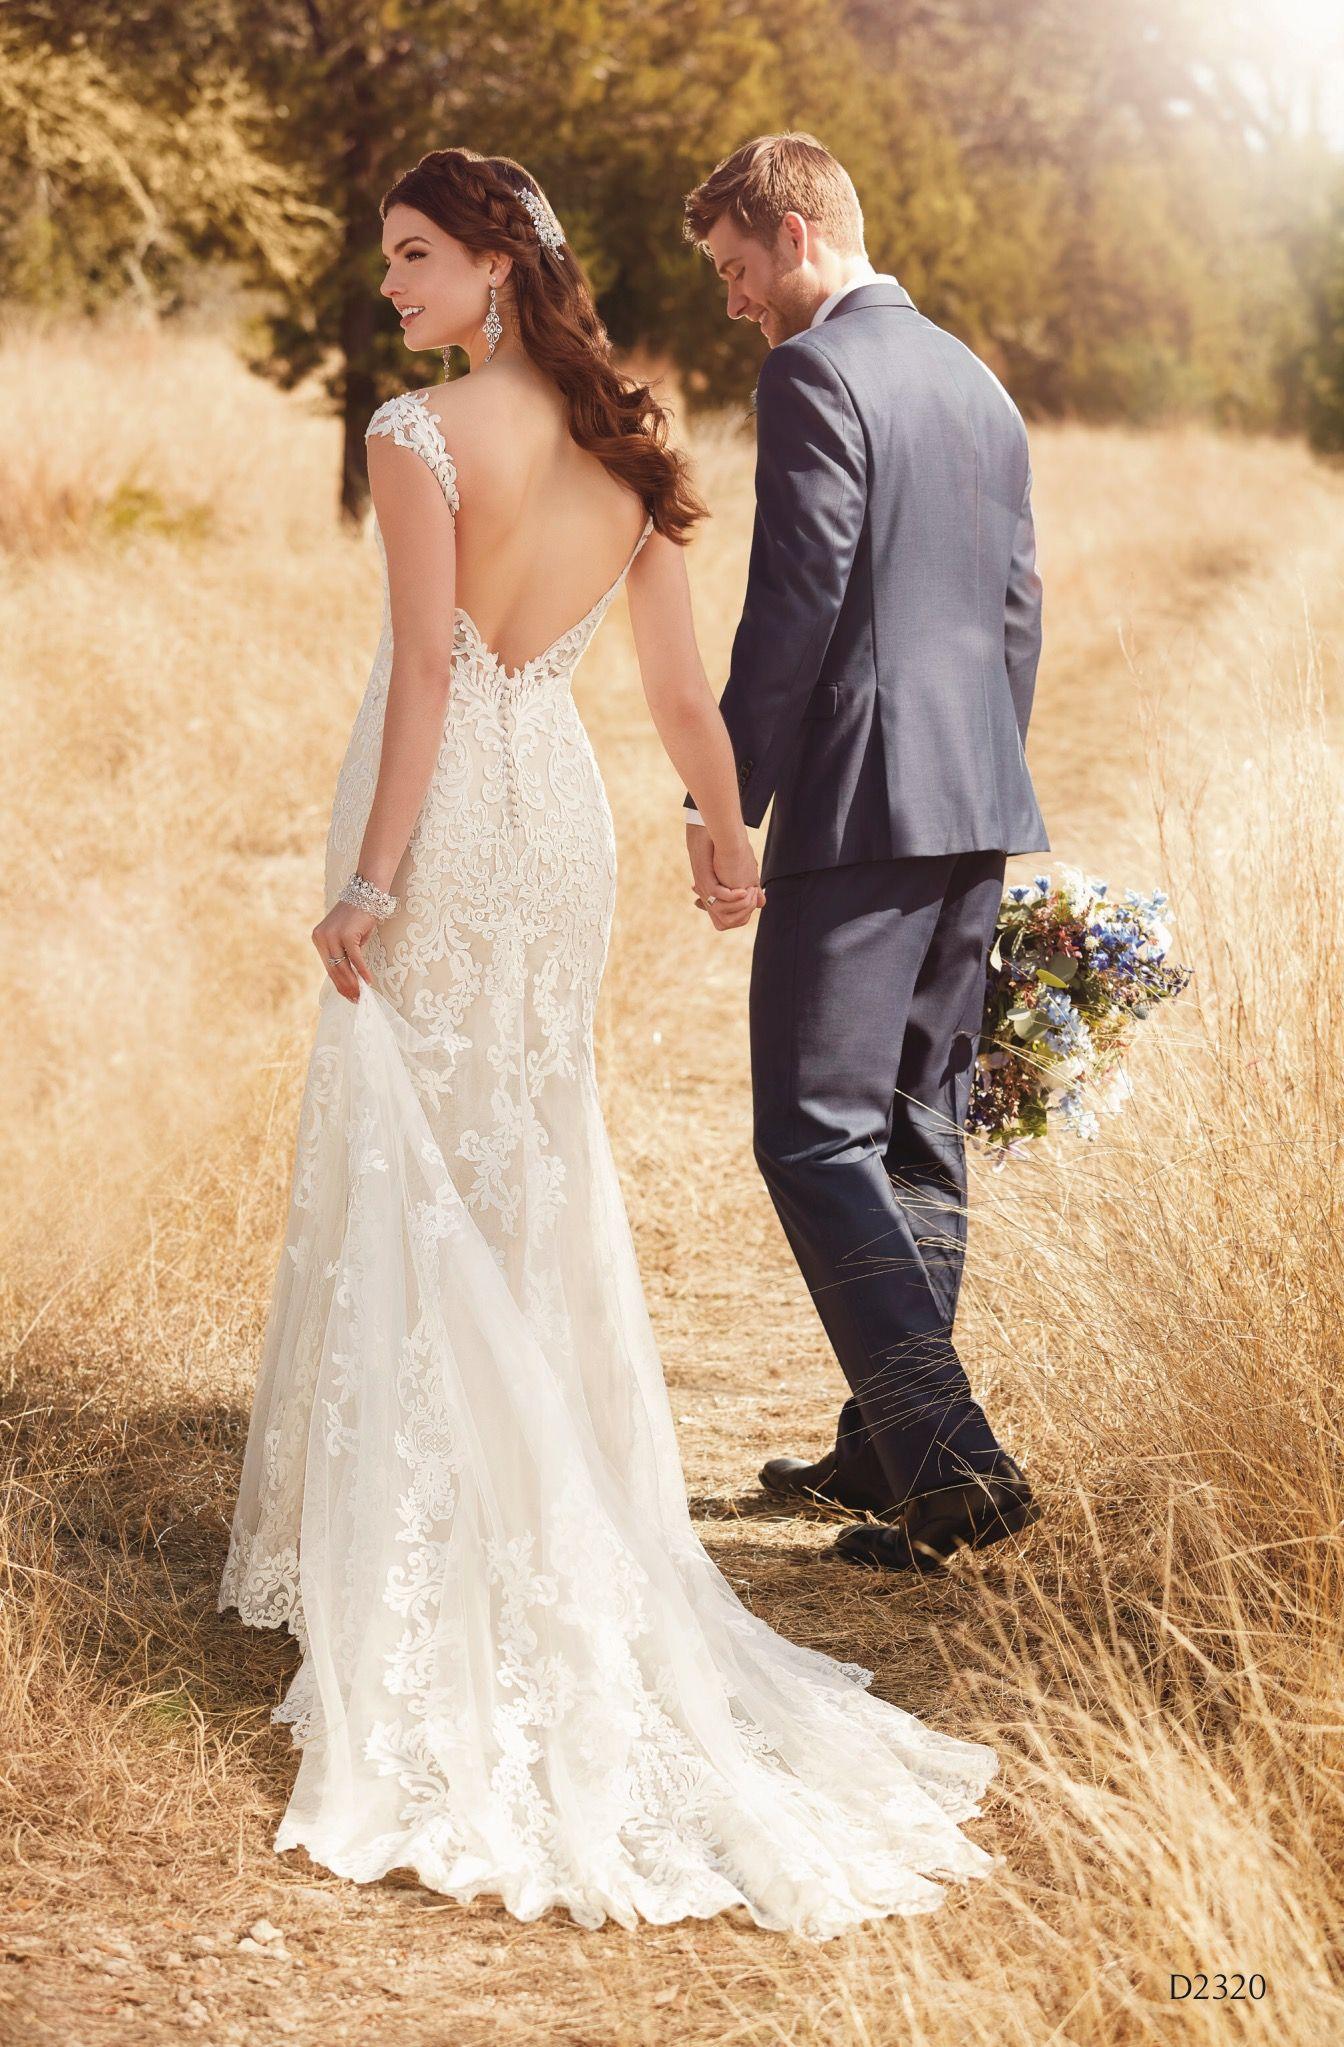 83e9ebb74927 D2320 Lace Wedding, Ethereal Wedding Dress, 2017 Wedding, Wedding Dress  Sizes, Backless